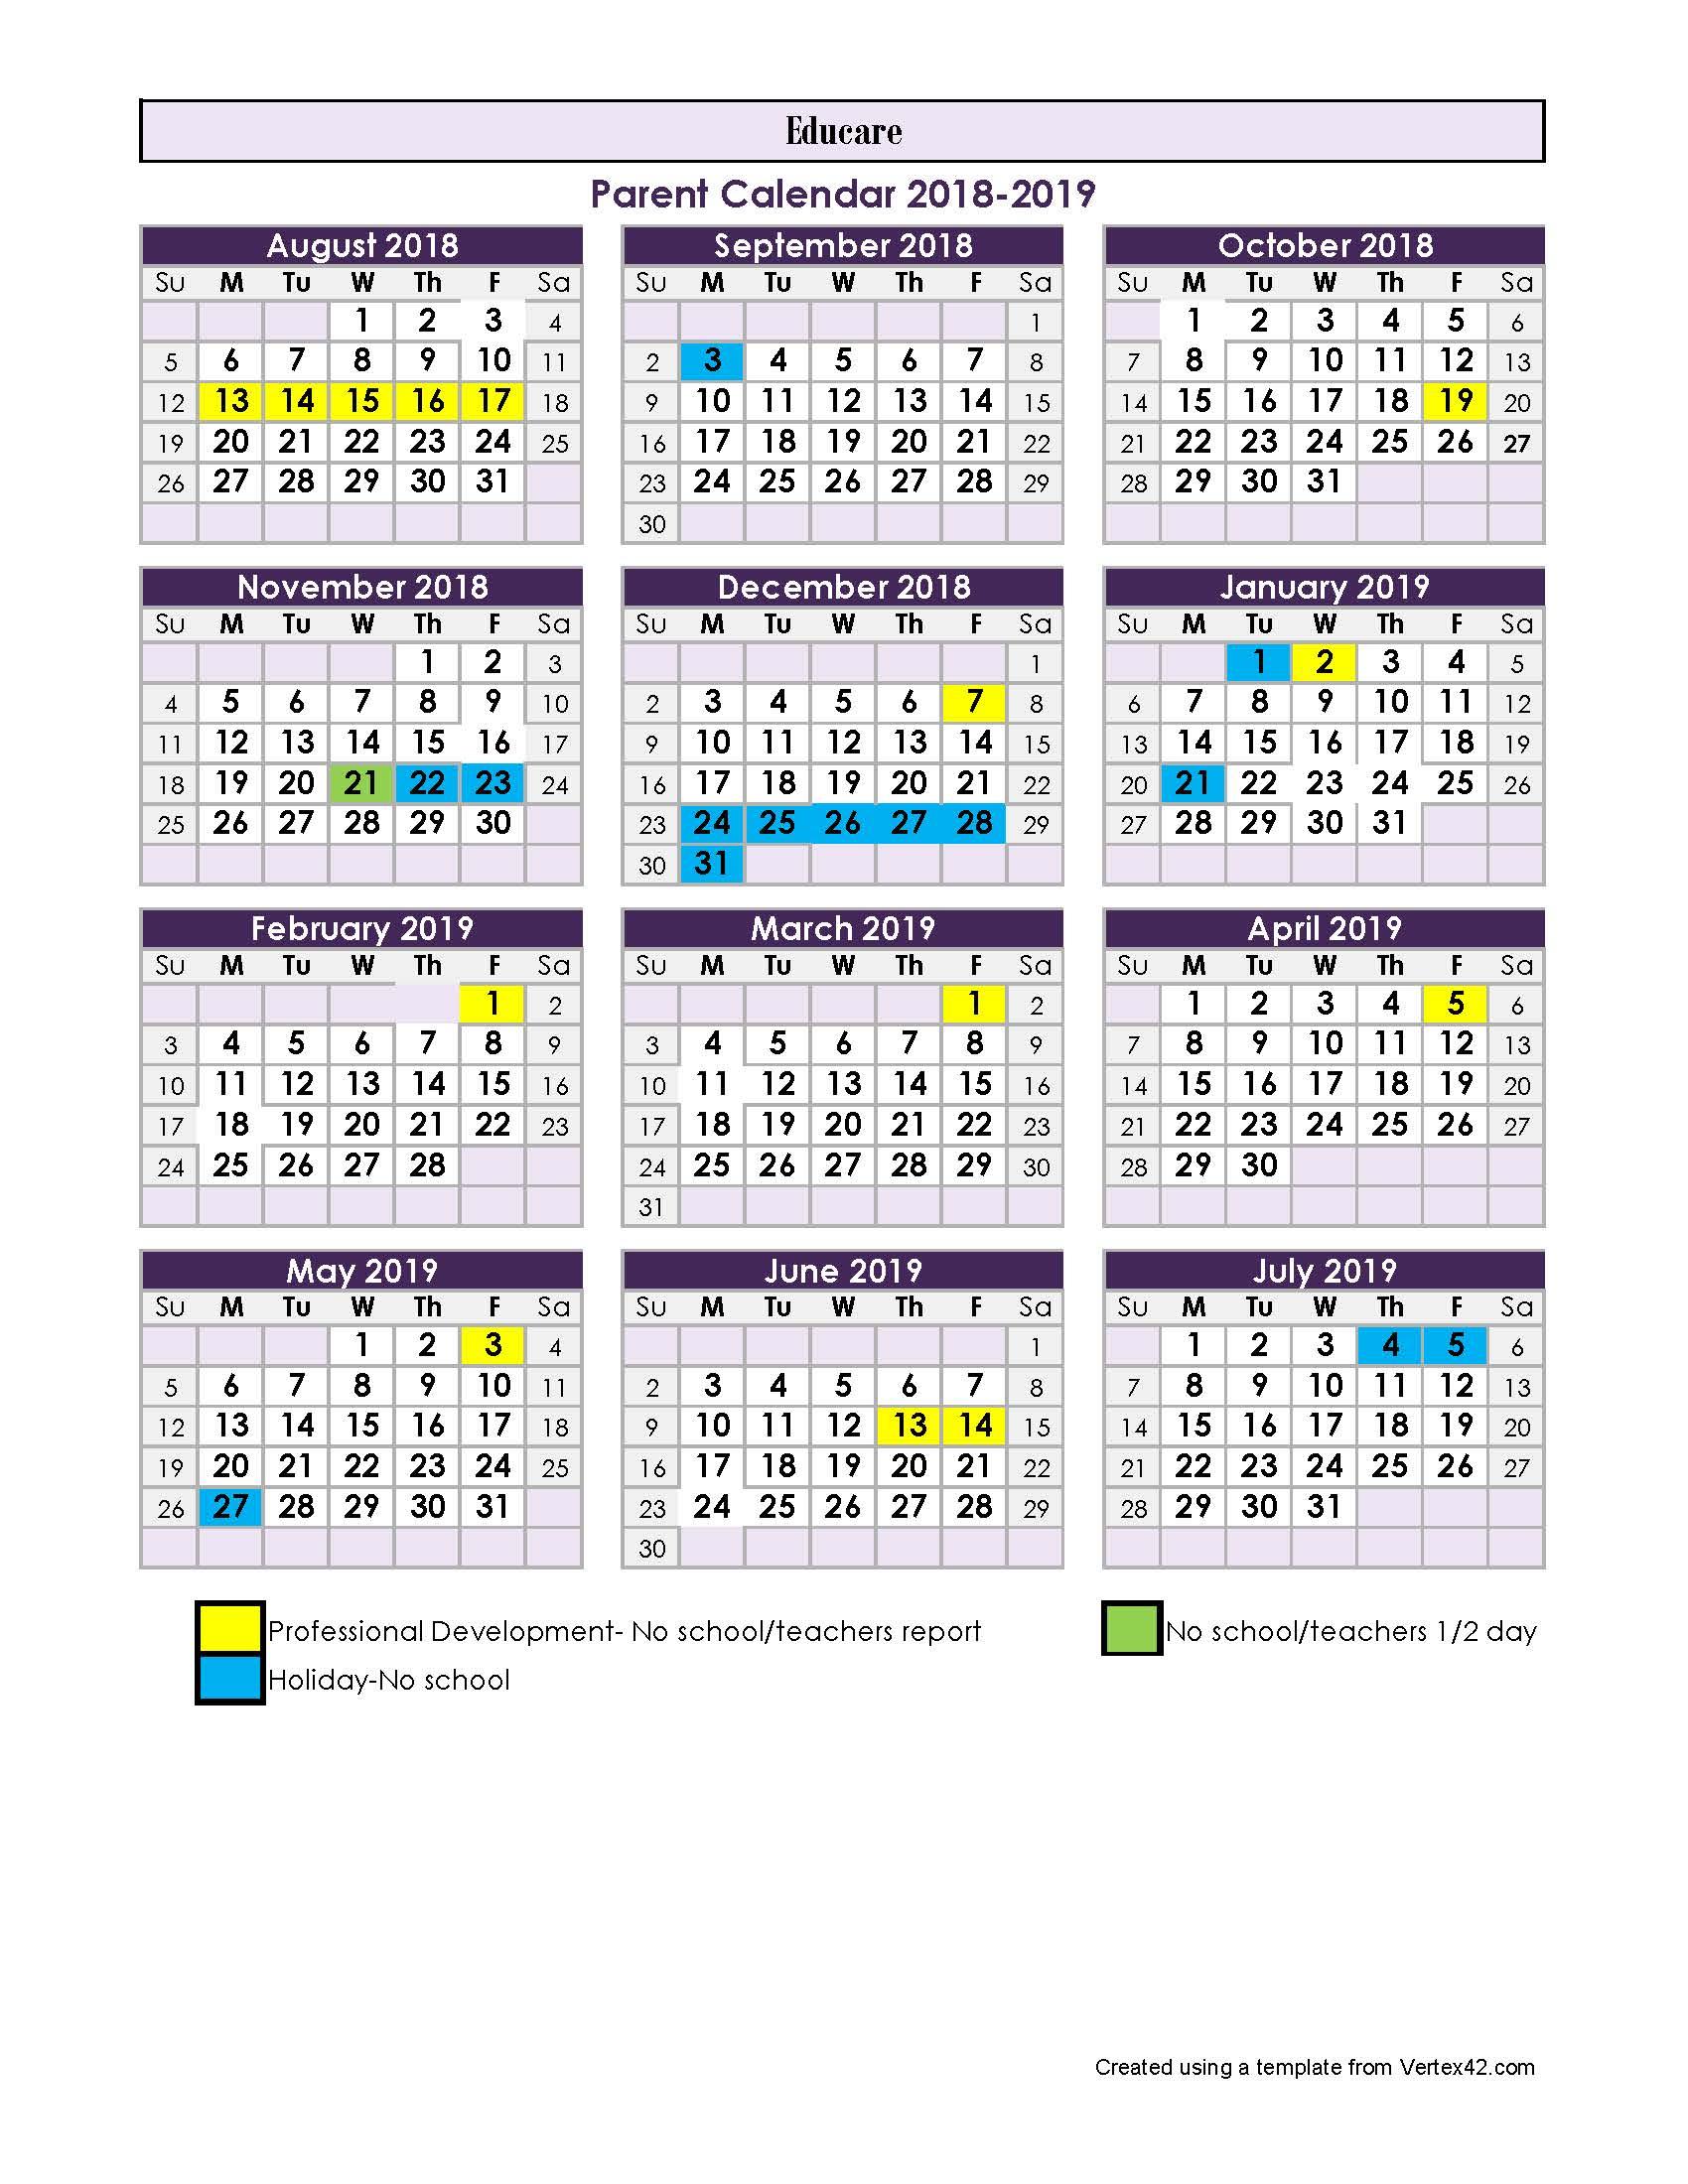 Educare Parent Calendar 18-19 - Tulsa Educare throughout Vertex Academic Calendar